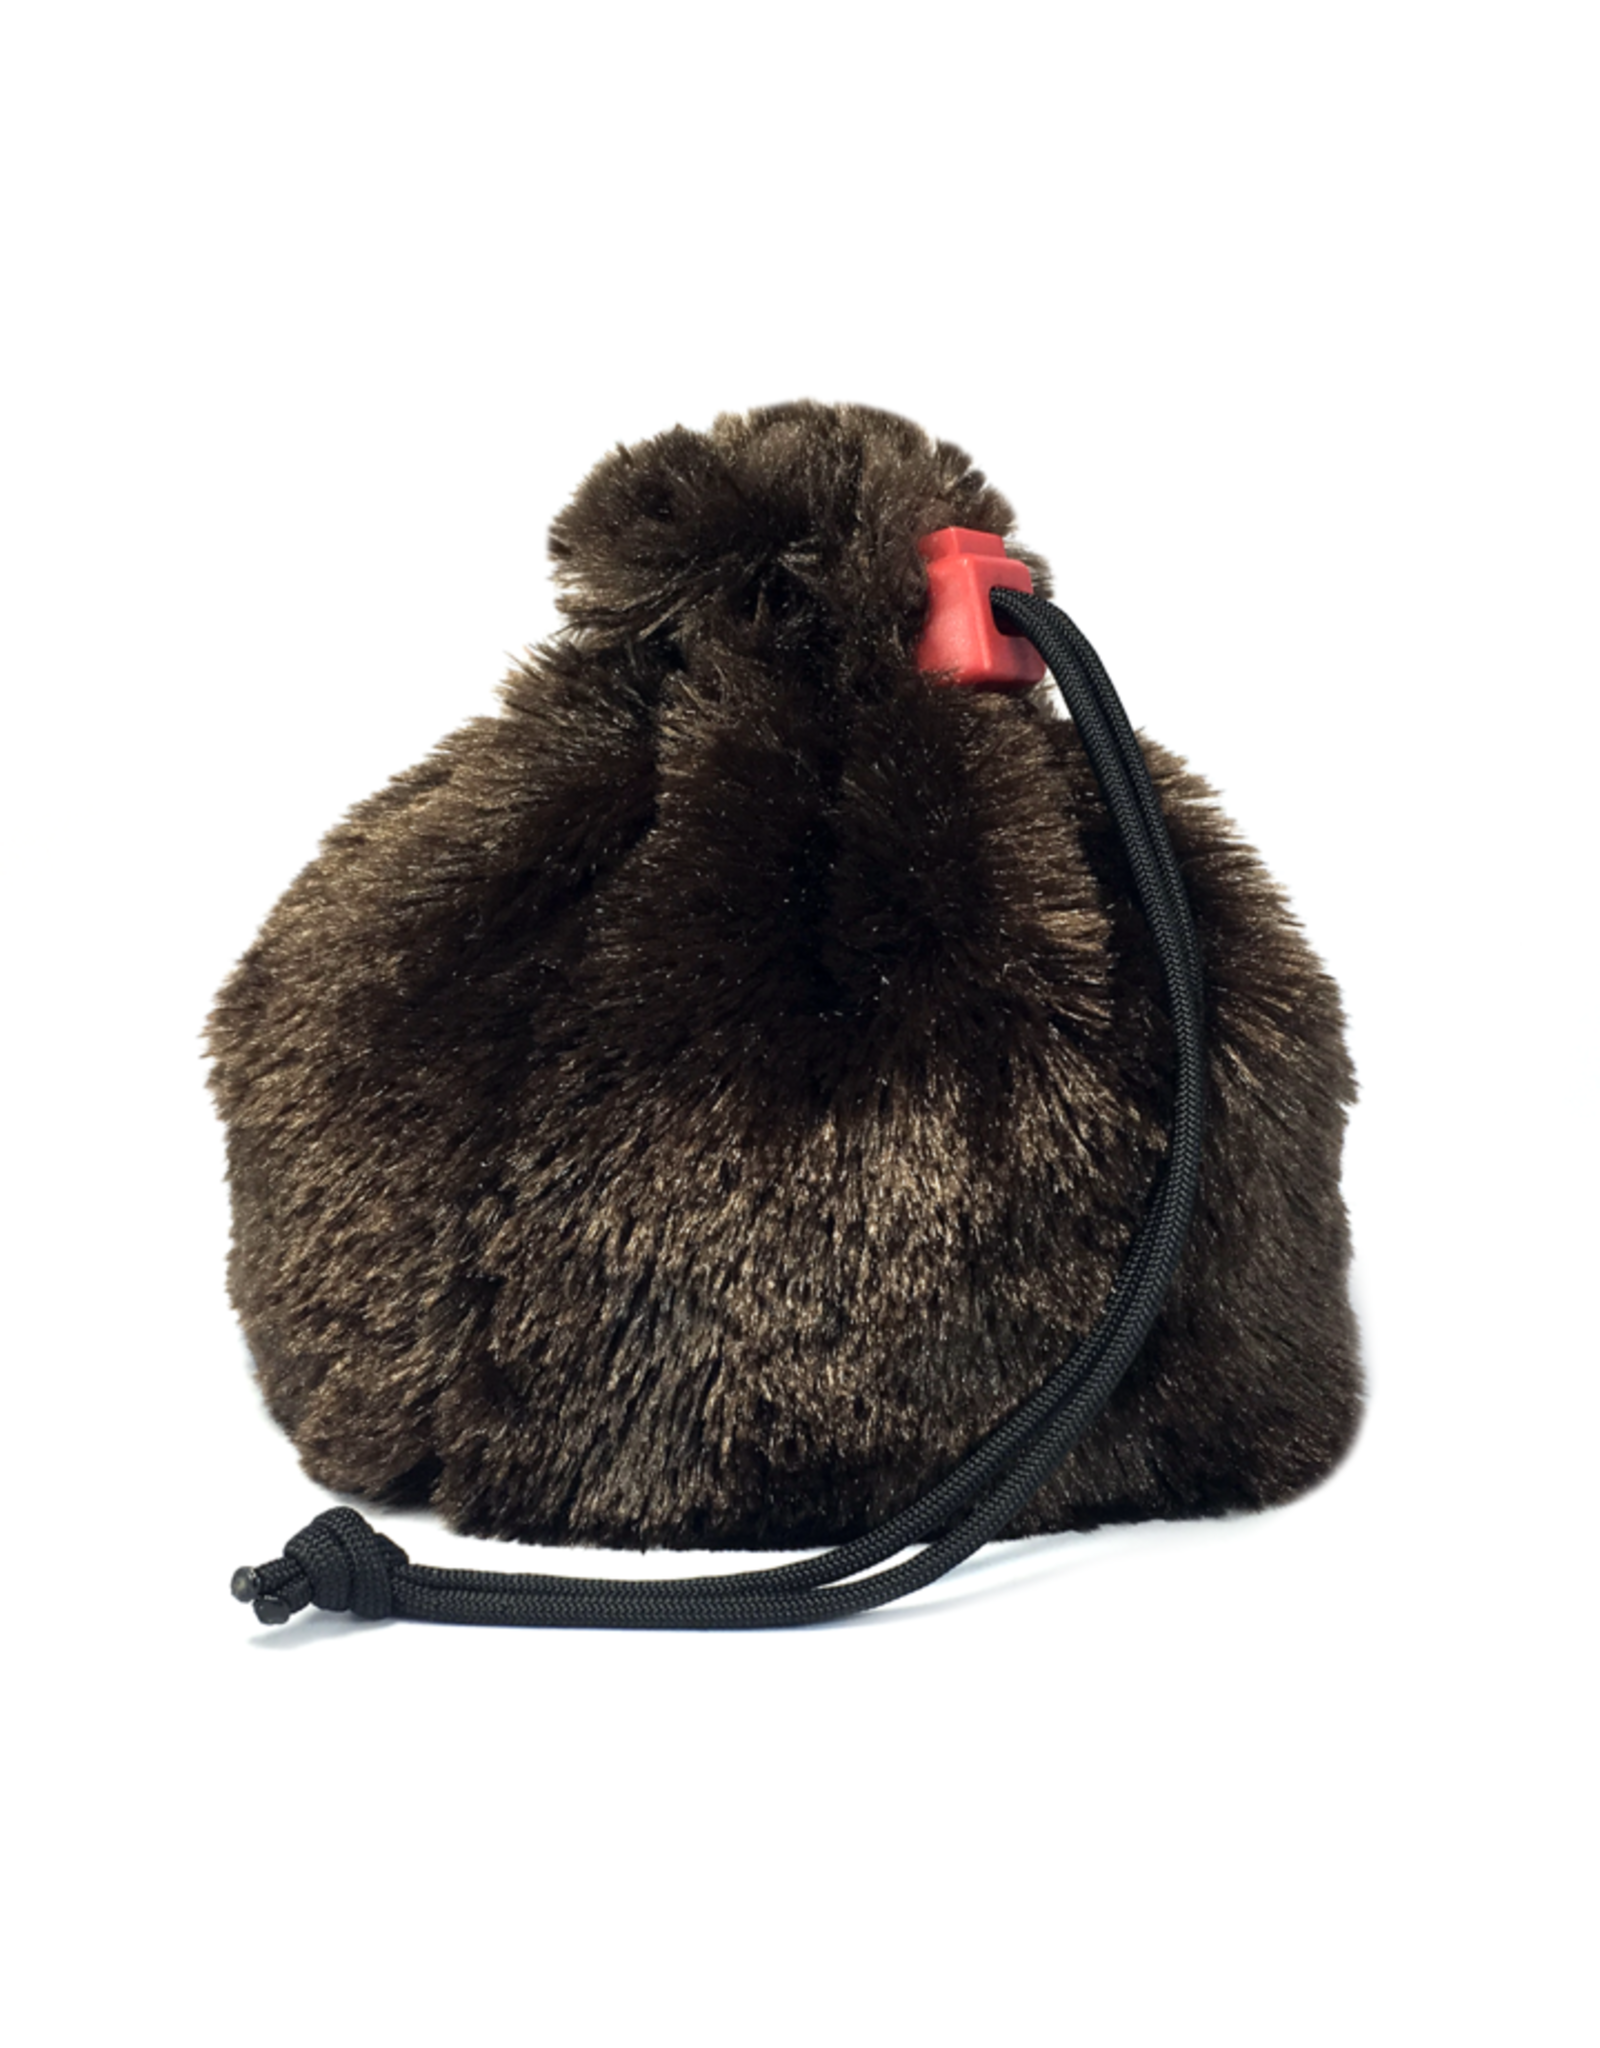 Red King Fur Dice Bag - Brown